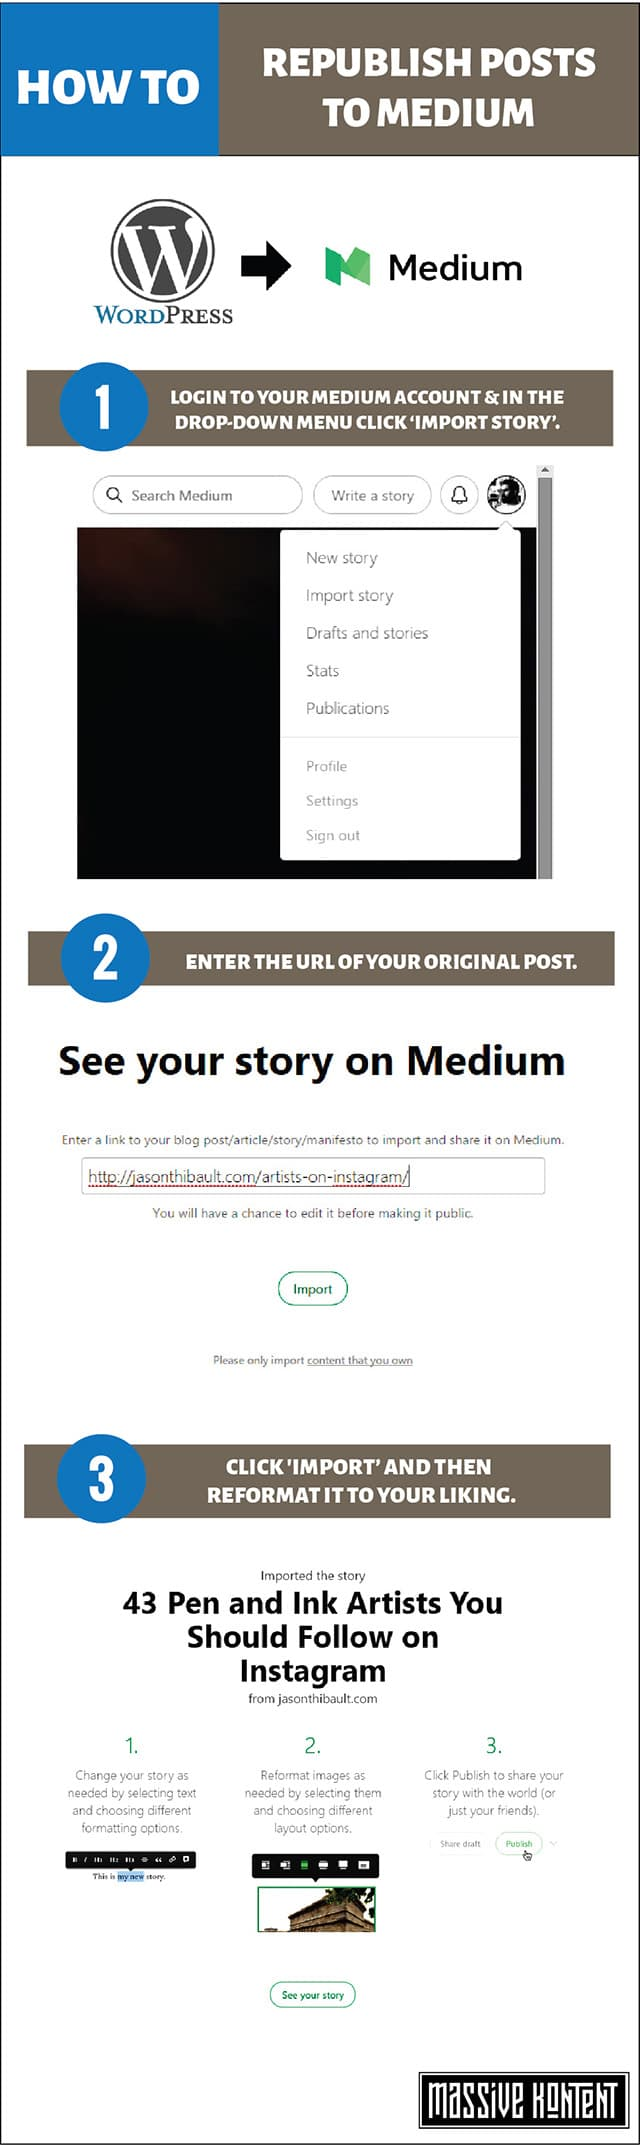 How to republish content on Medium